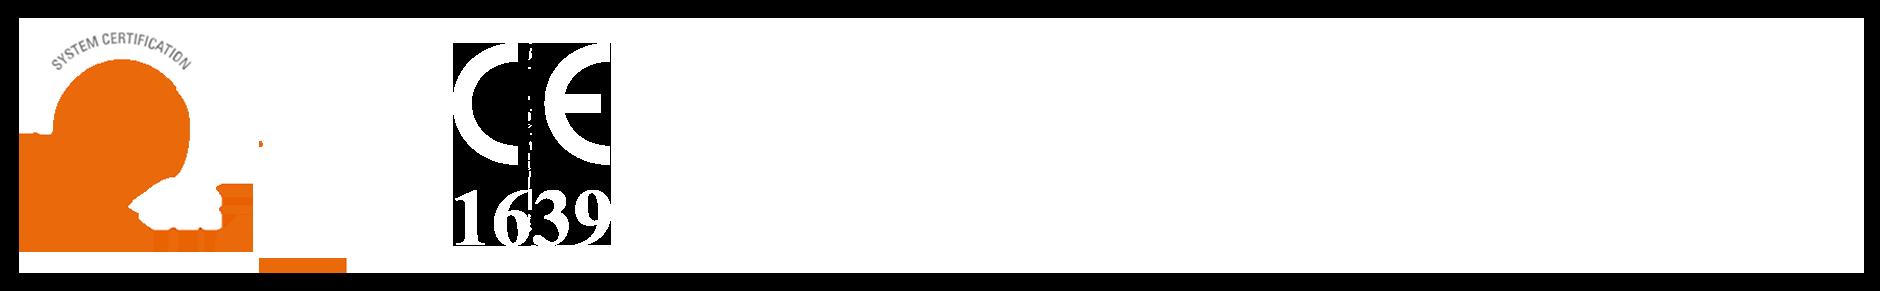 Footer logos update 2021